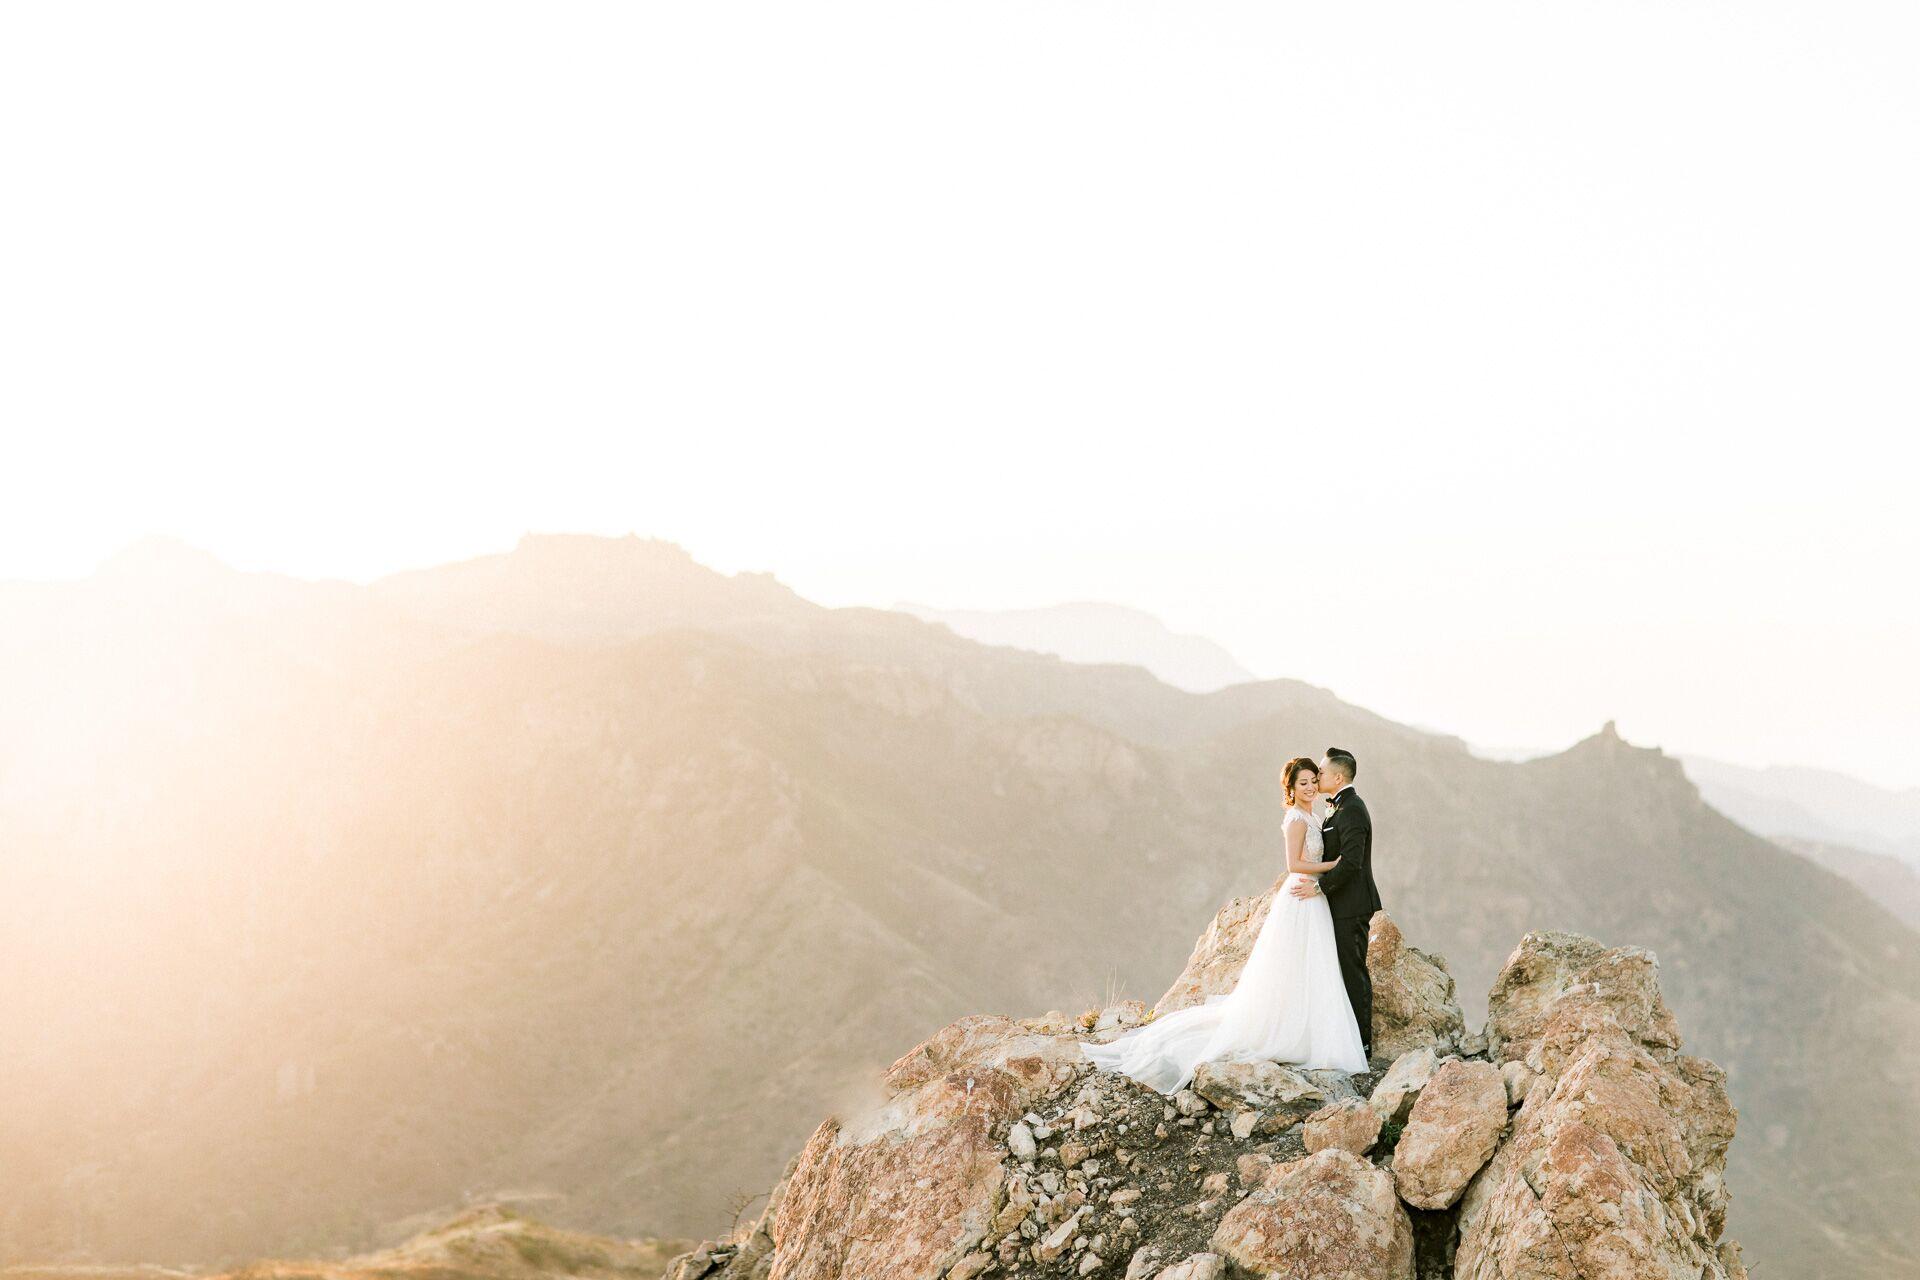 Koman Photography and Cinematography | Wedding Photographers